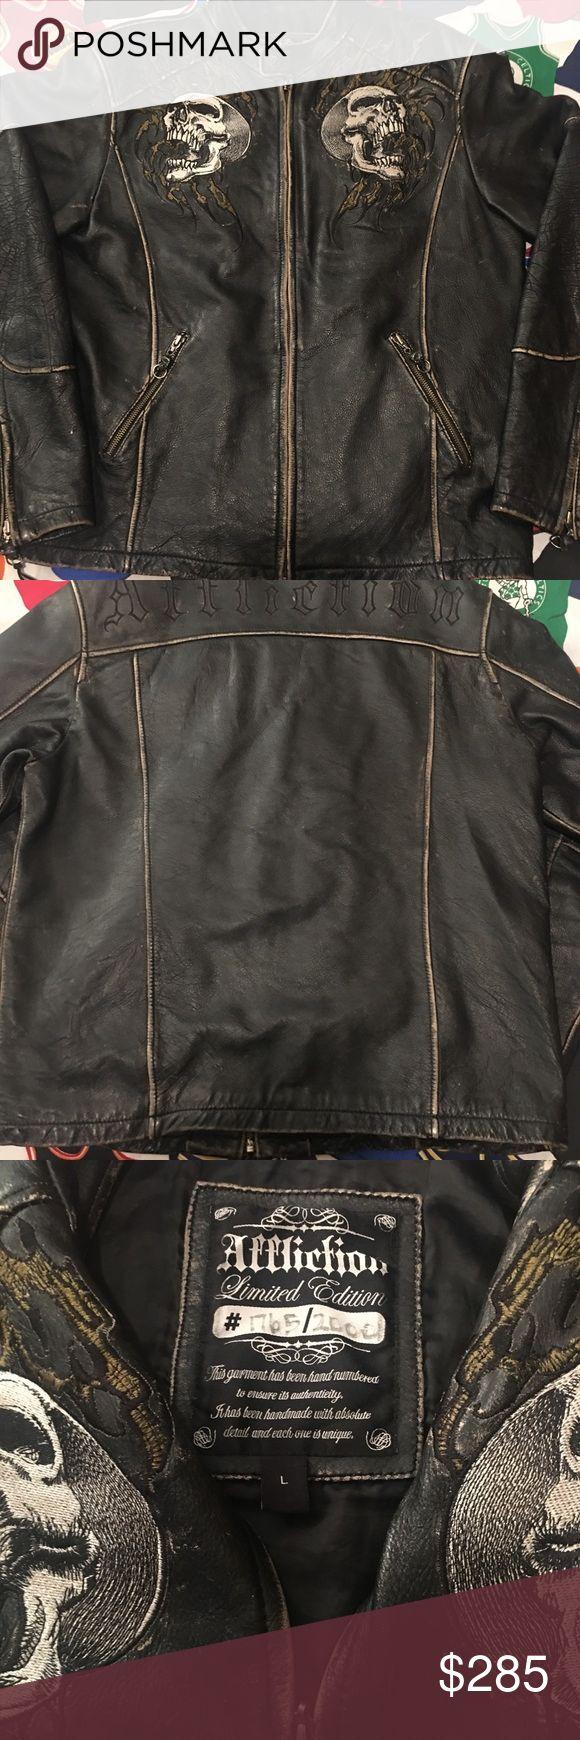 Affliction Limited Edition Skull Leather Jacket